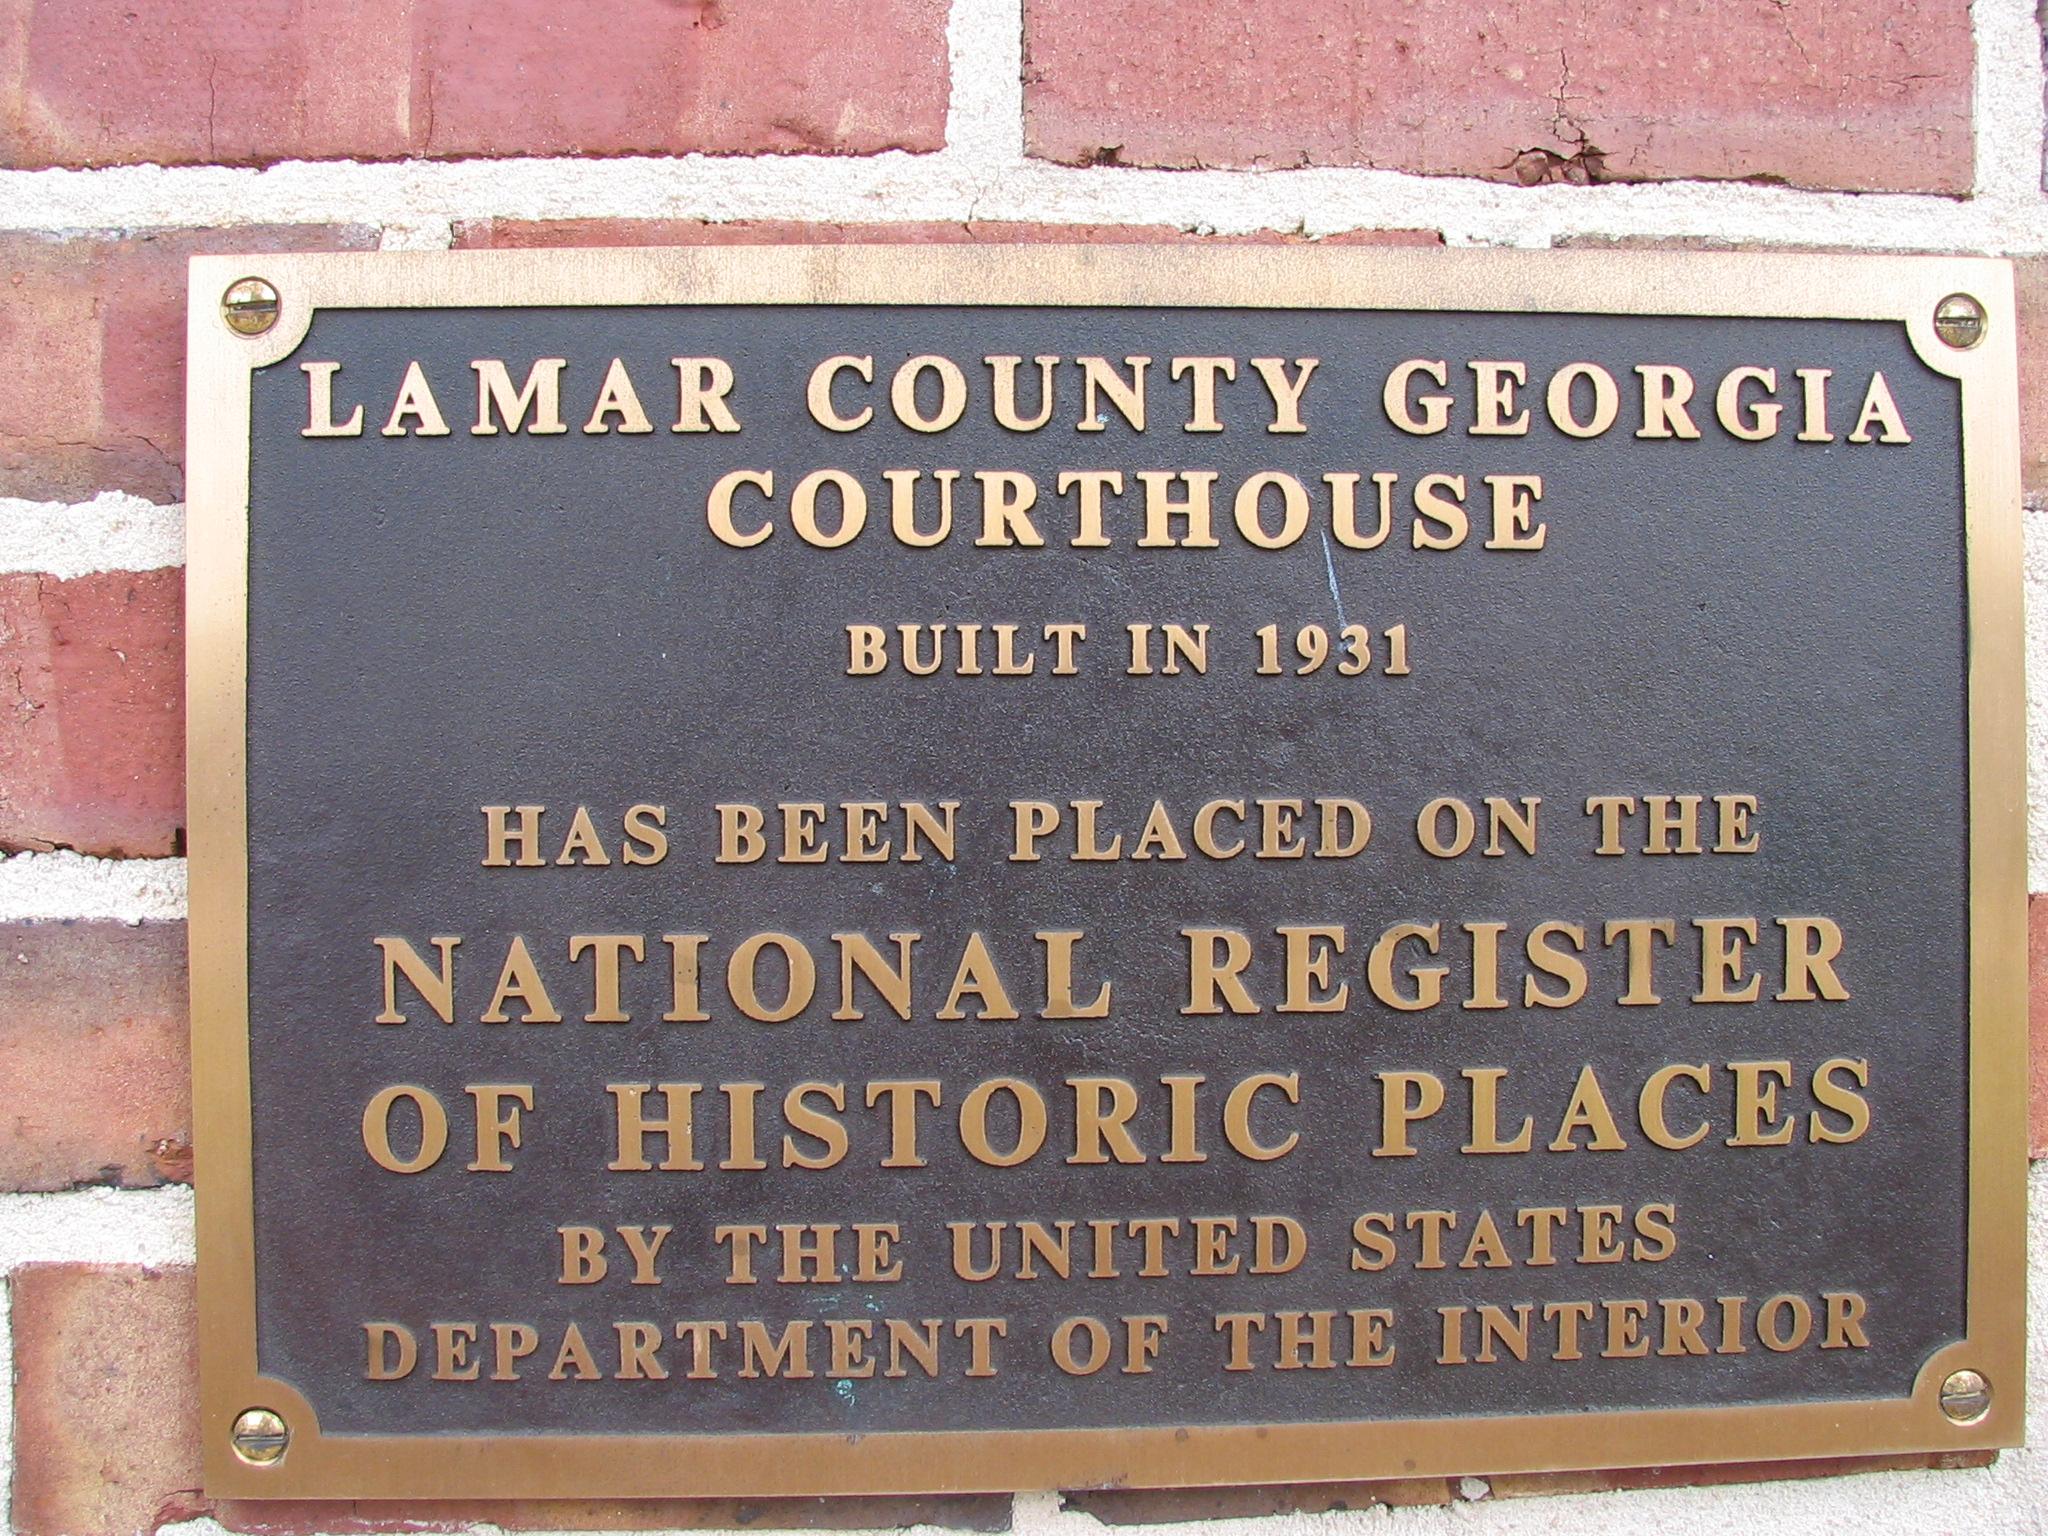 Lamar County Courthouse, Barnesville GA | Flickr - Photo ...